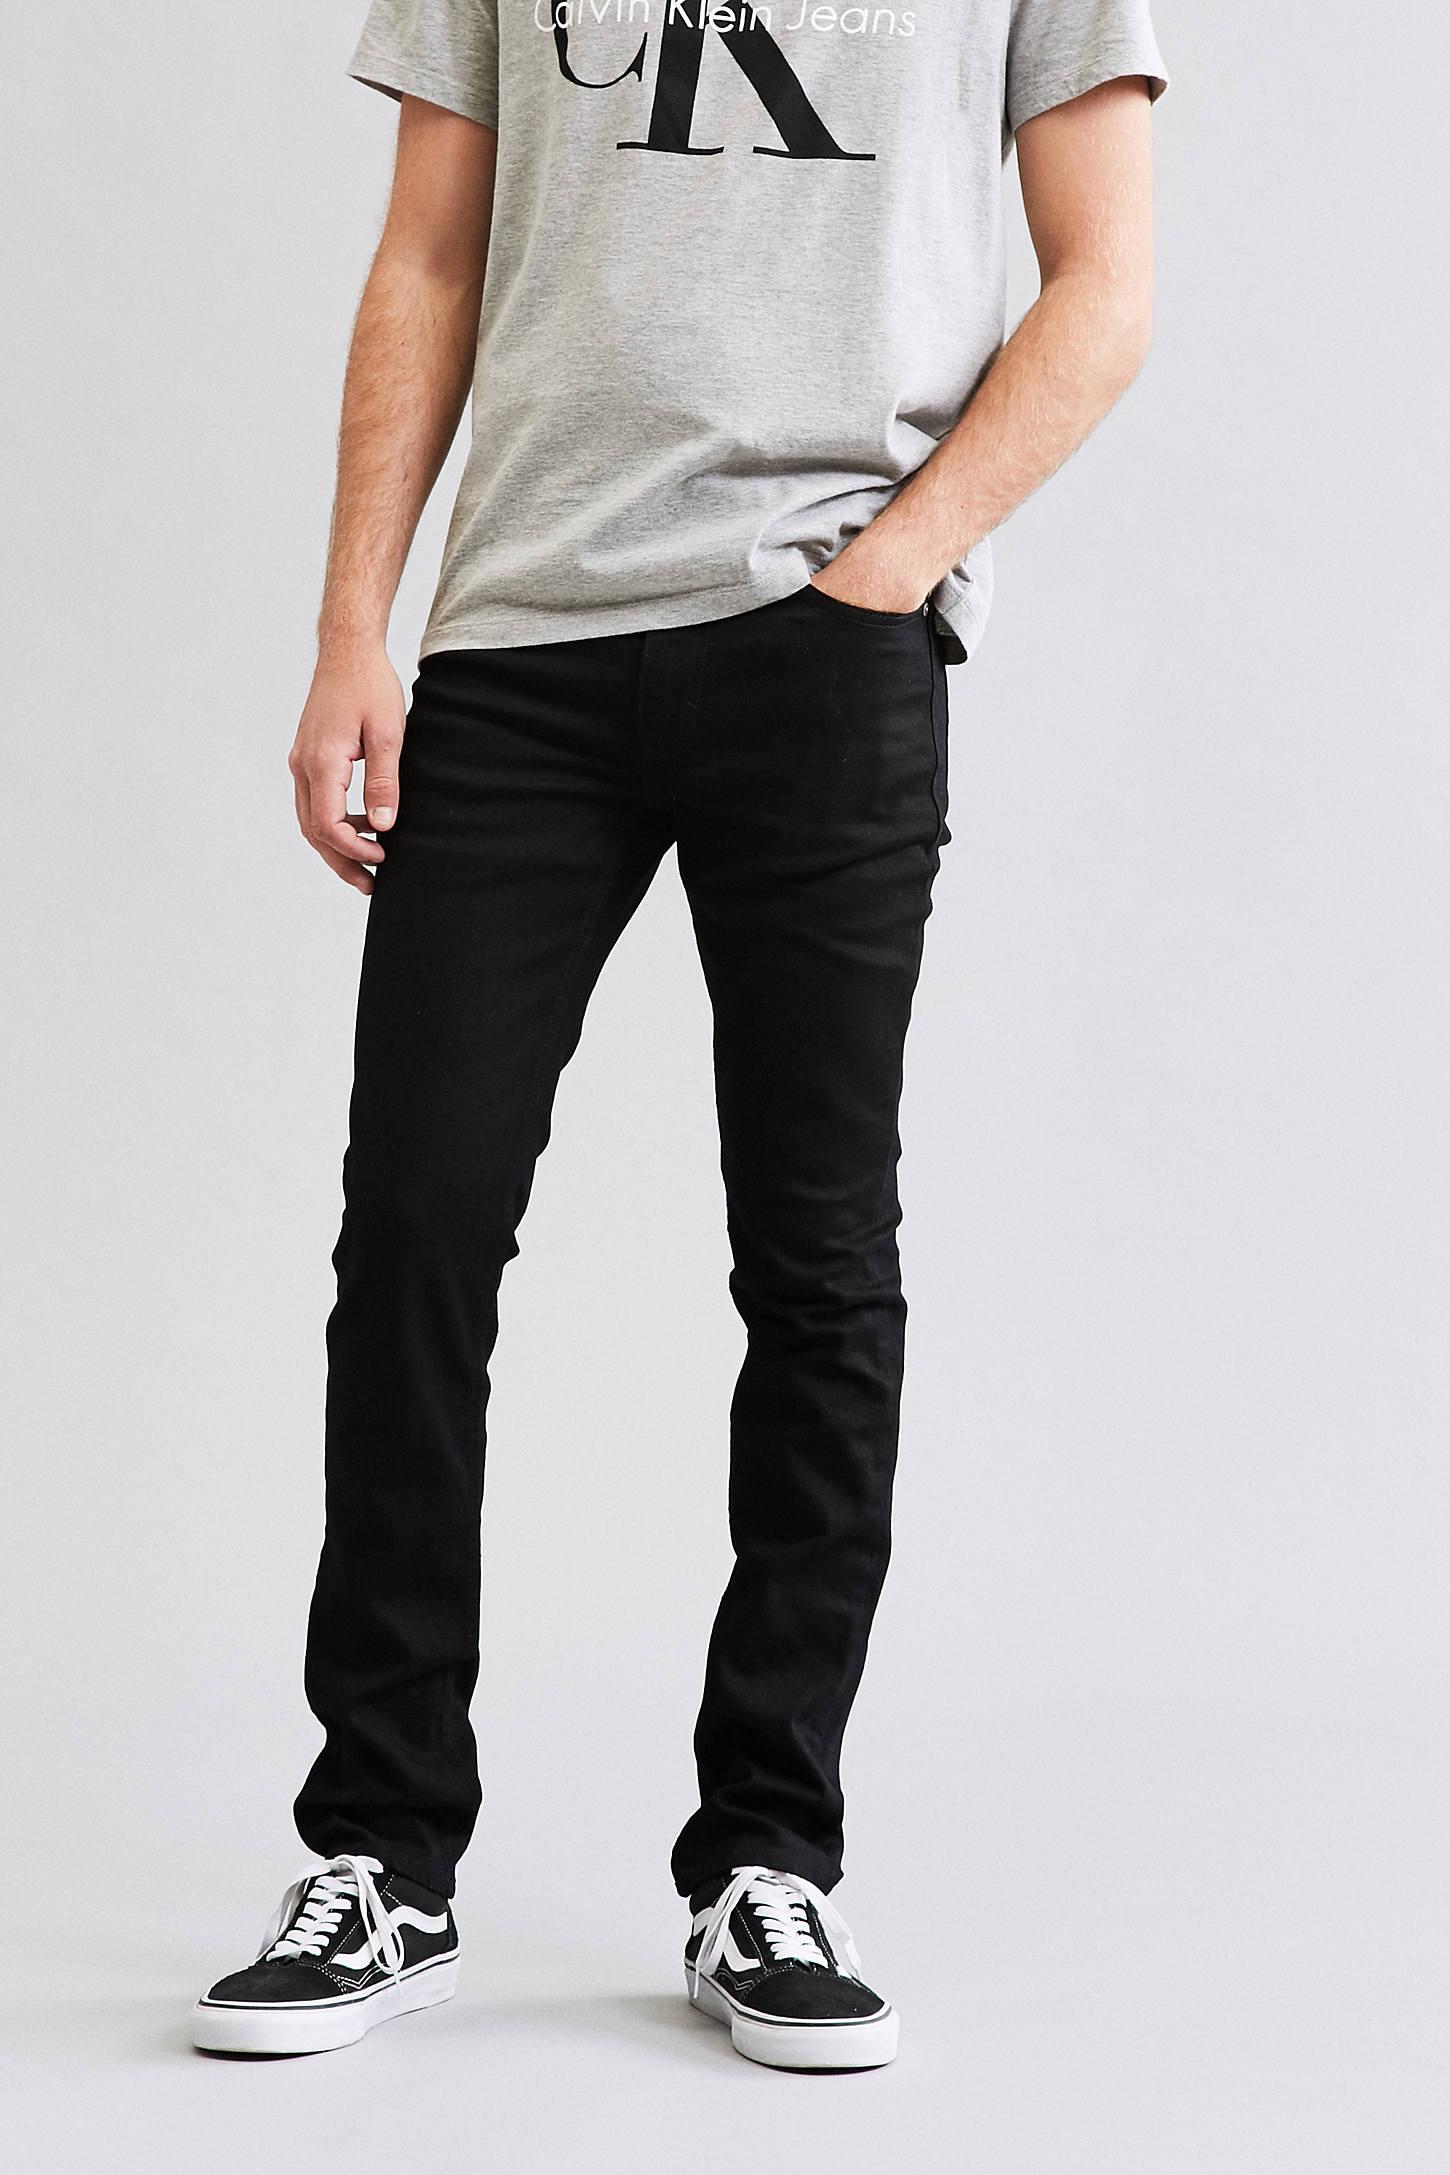 Calvin Klein Black Stretch Skinny Jean | Urban Outfitters